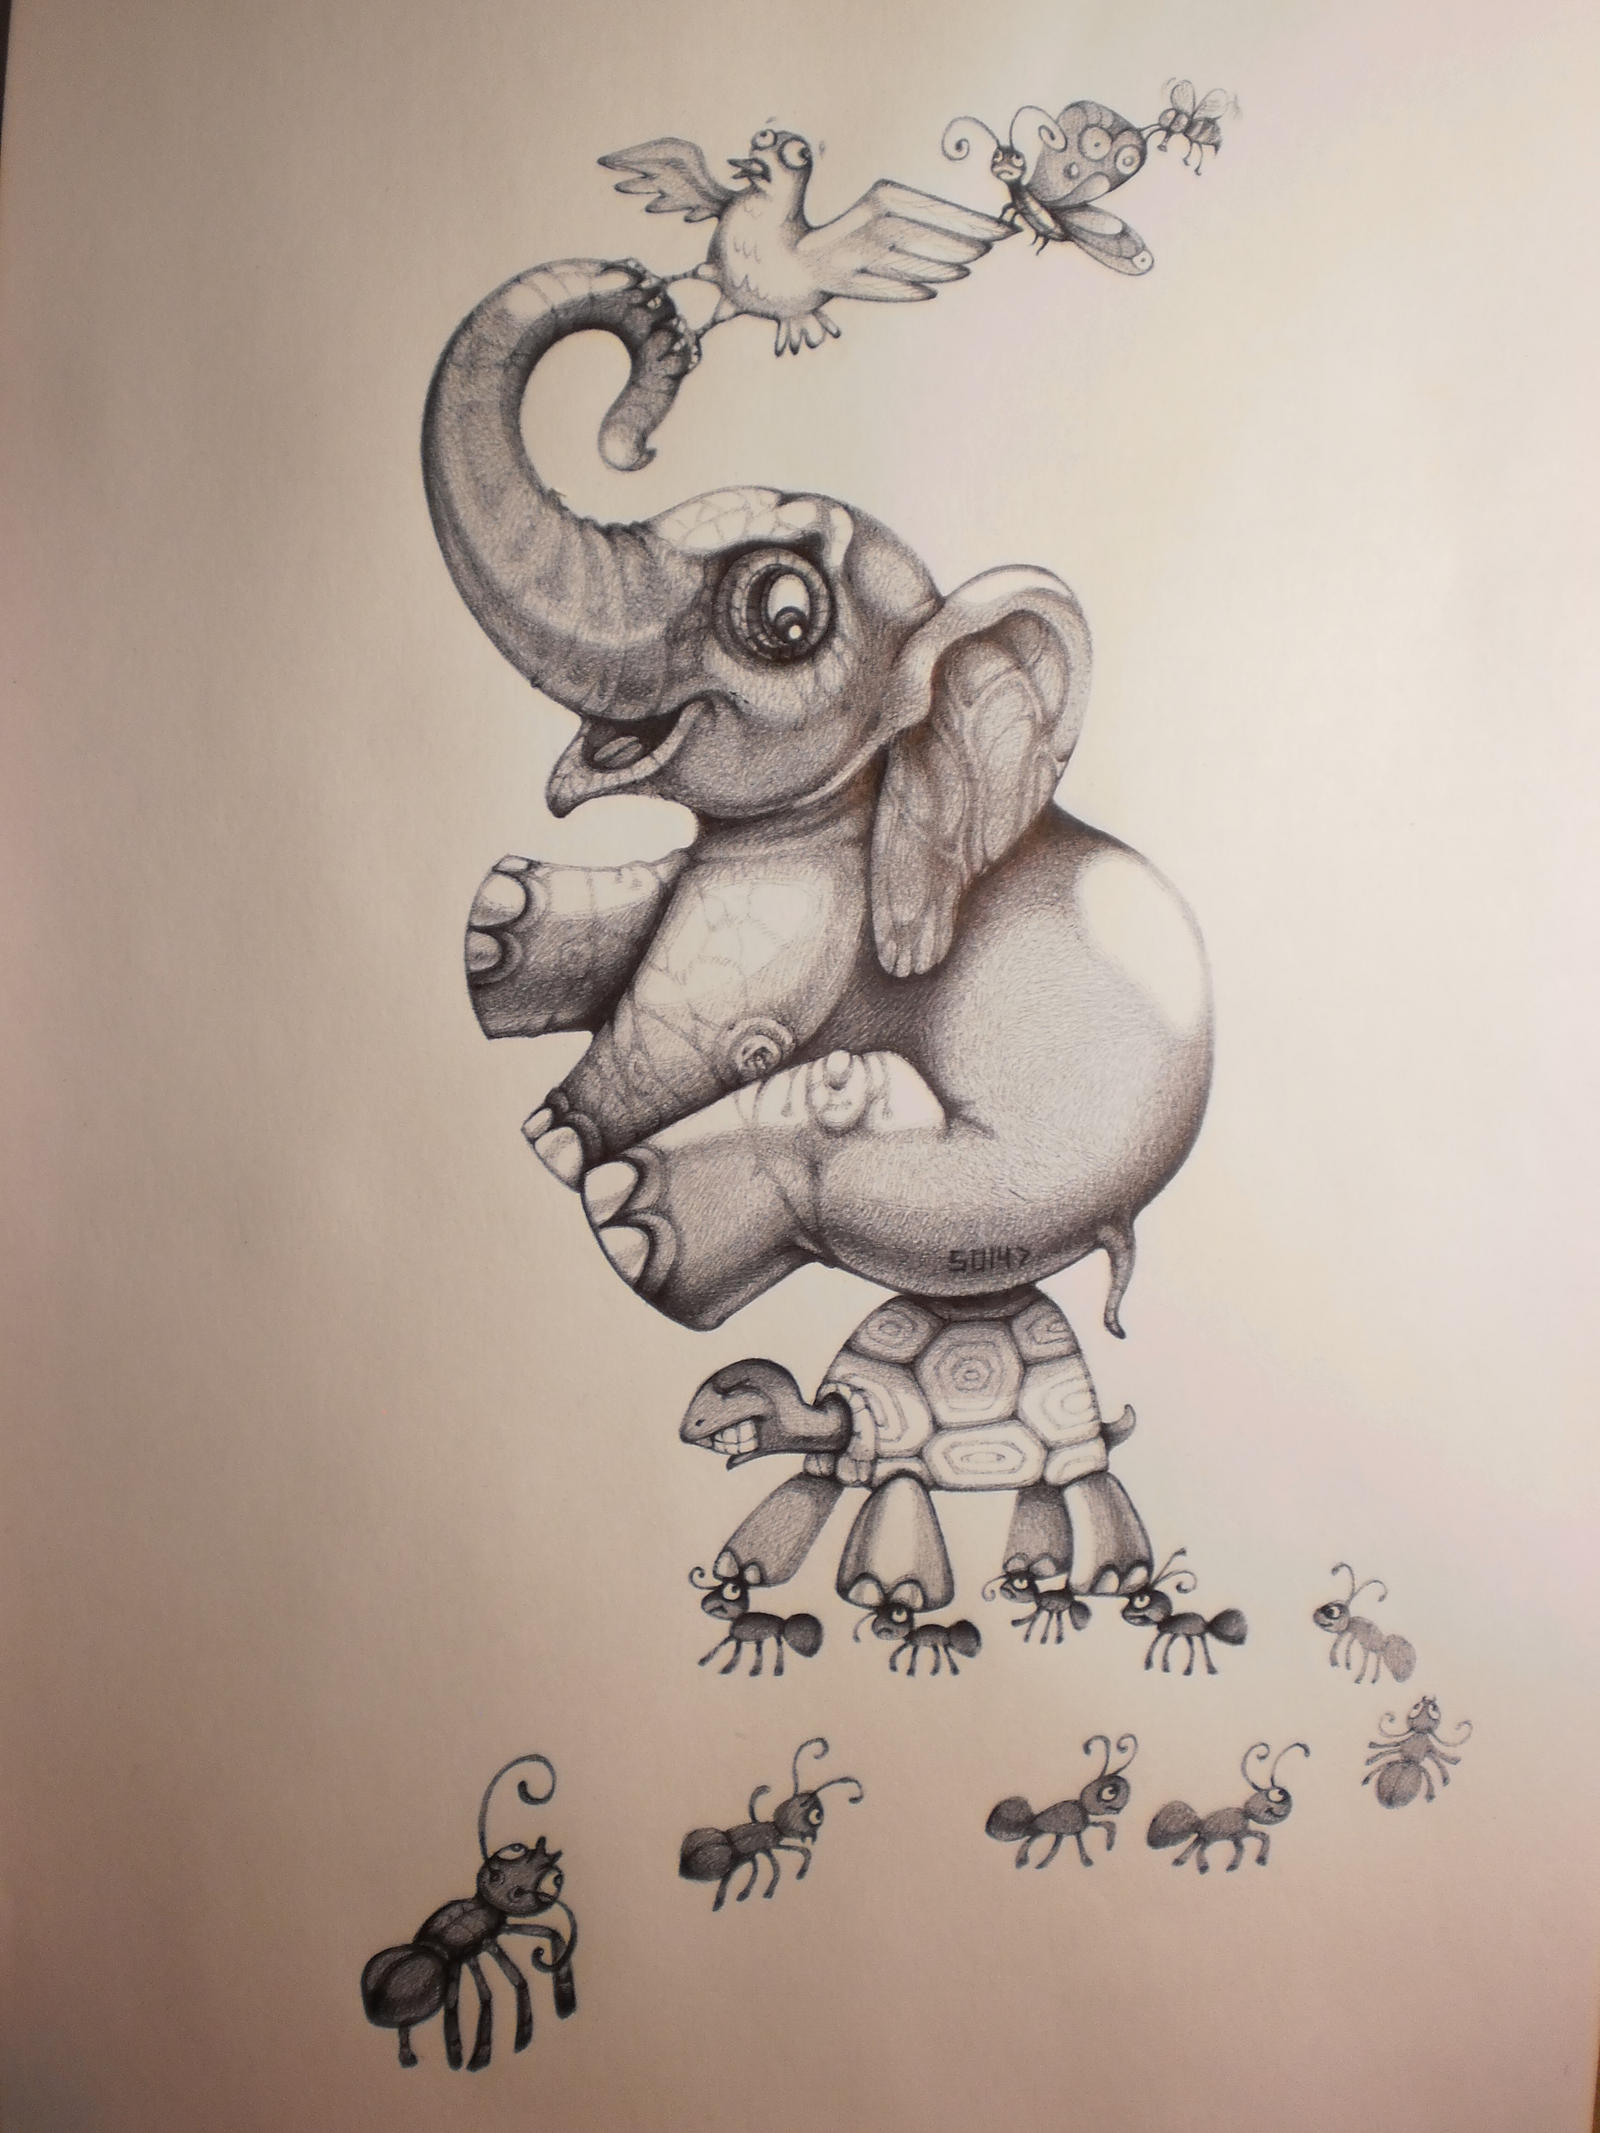 Animal crazy irony by solecancinos